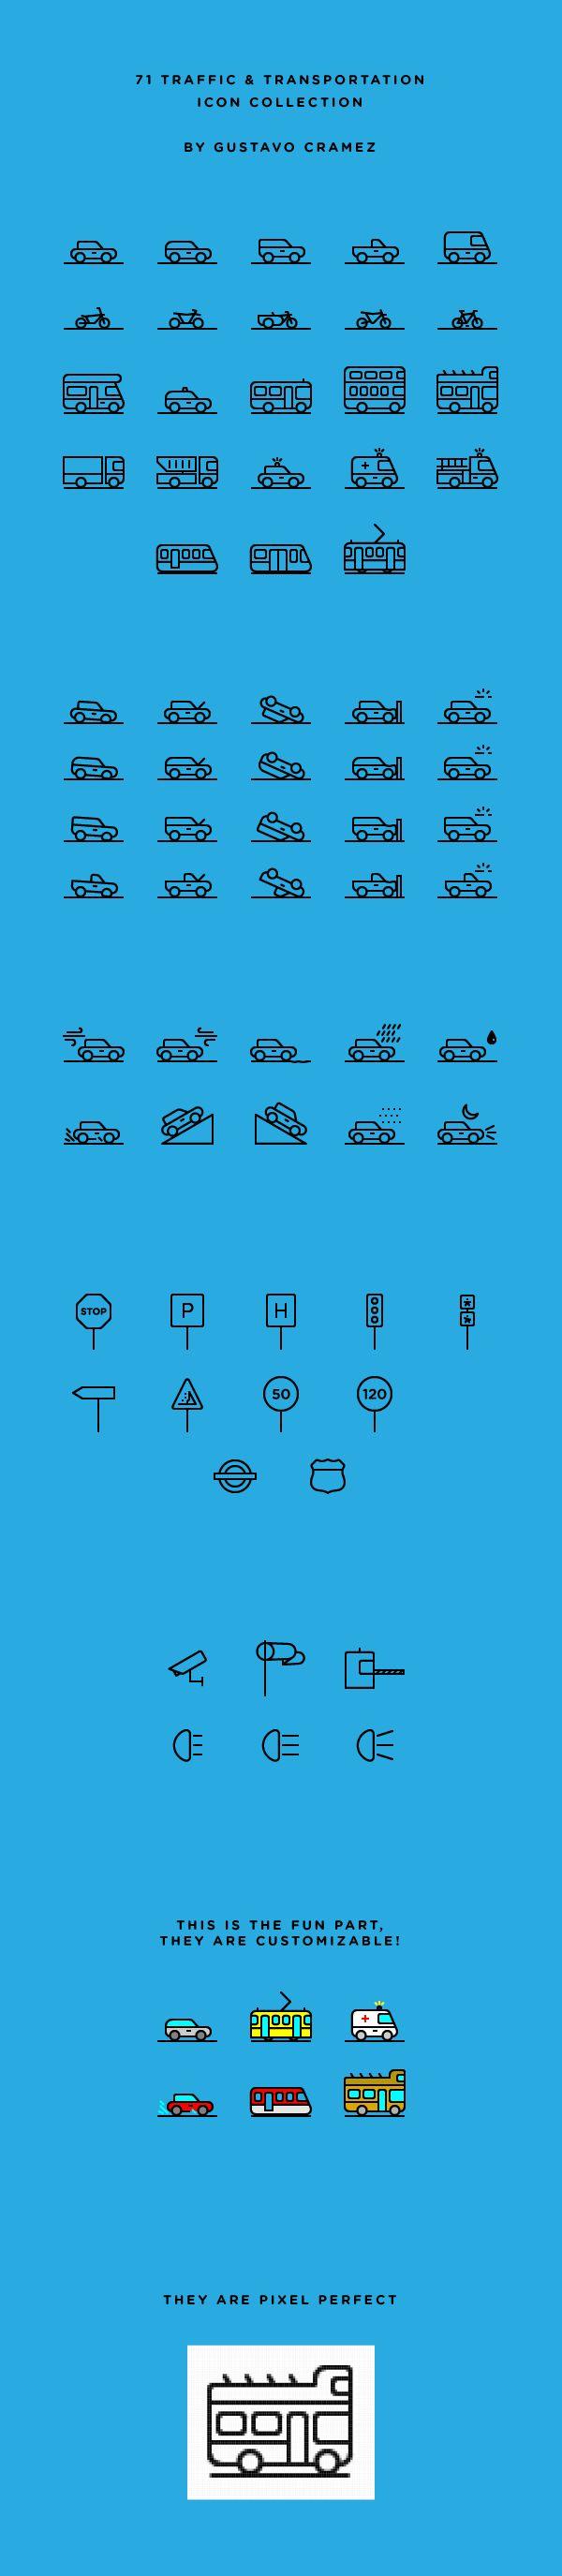 71 Traffic Icons